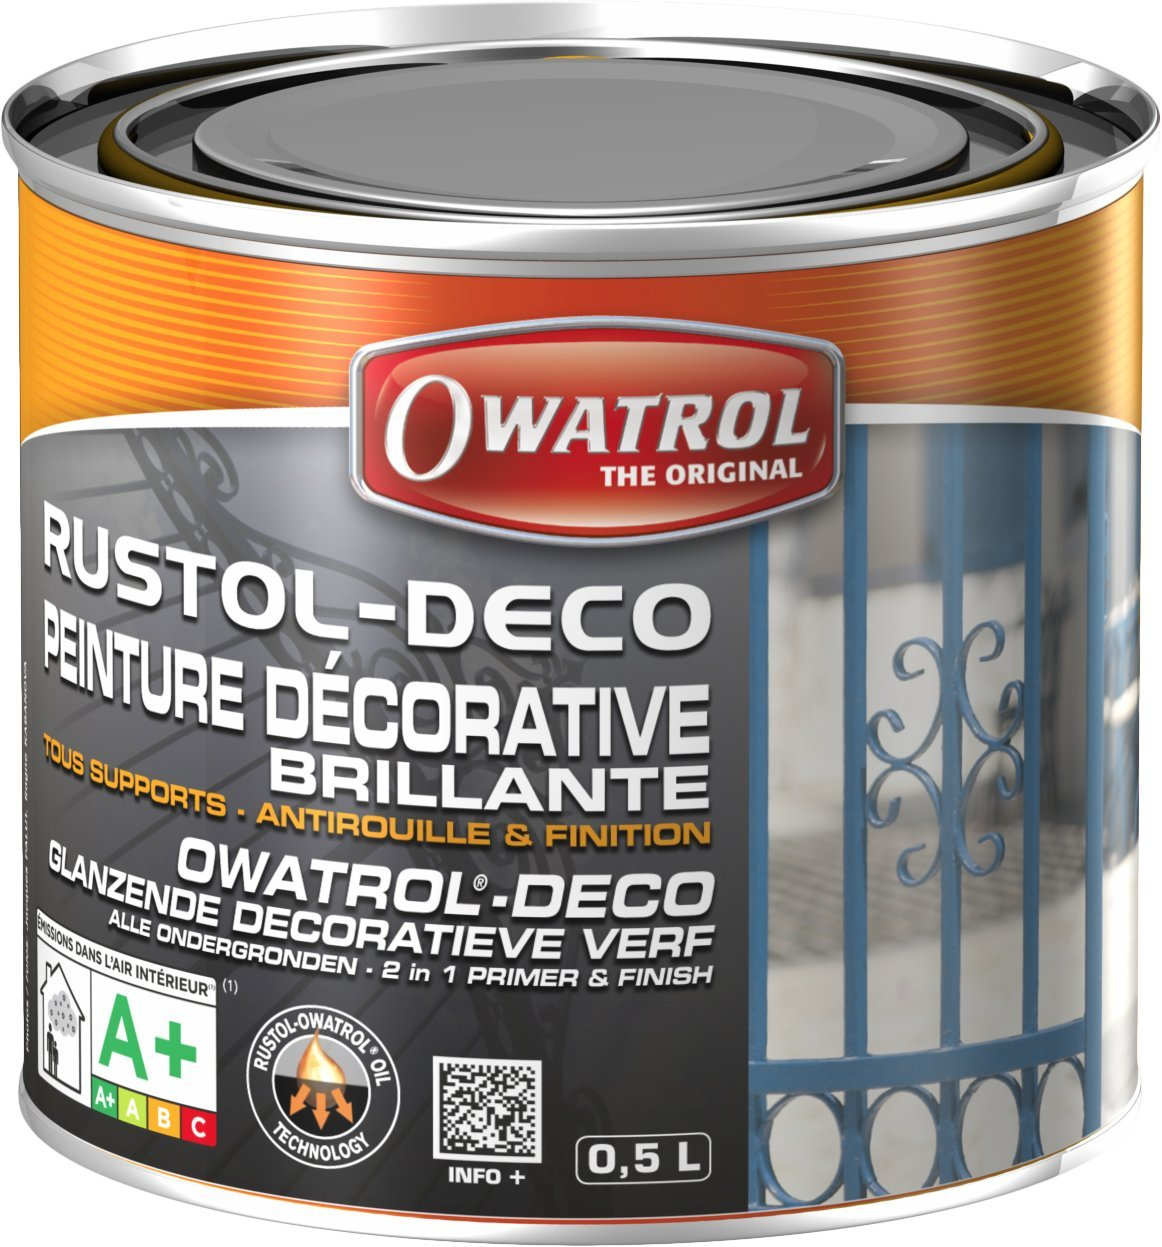 Owatrol Rustol-Deco Peinture dé corative brillante 0, 5 L Vert 930